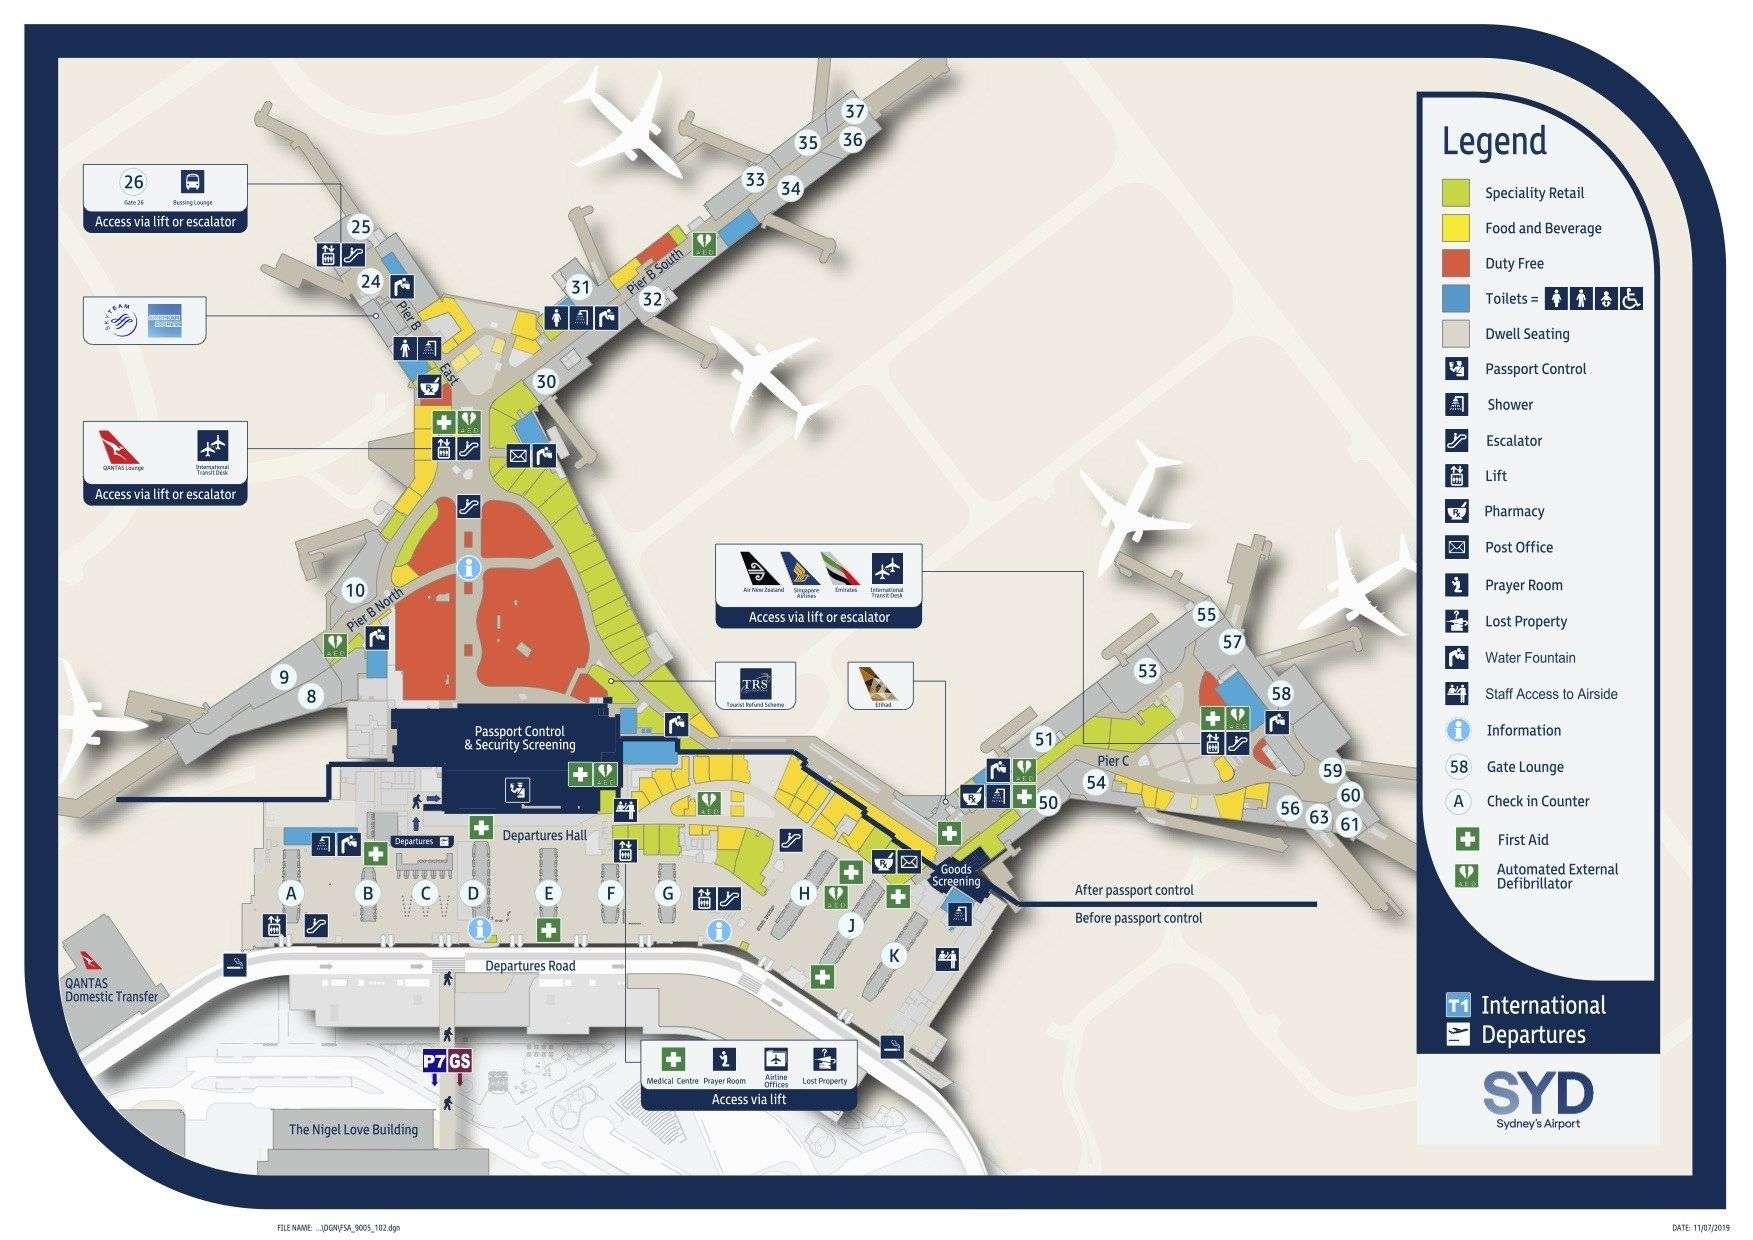 terminal 2 sydney domestic airport map Sydney Airport Map terminal 2 sydney domestic airport map